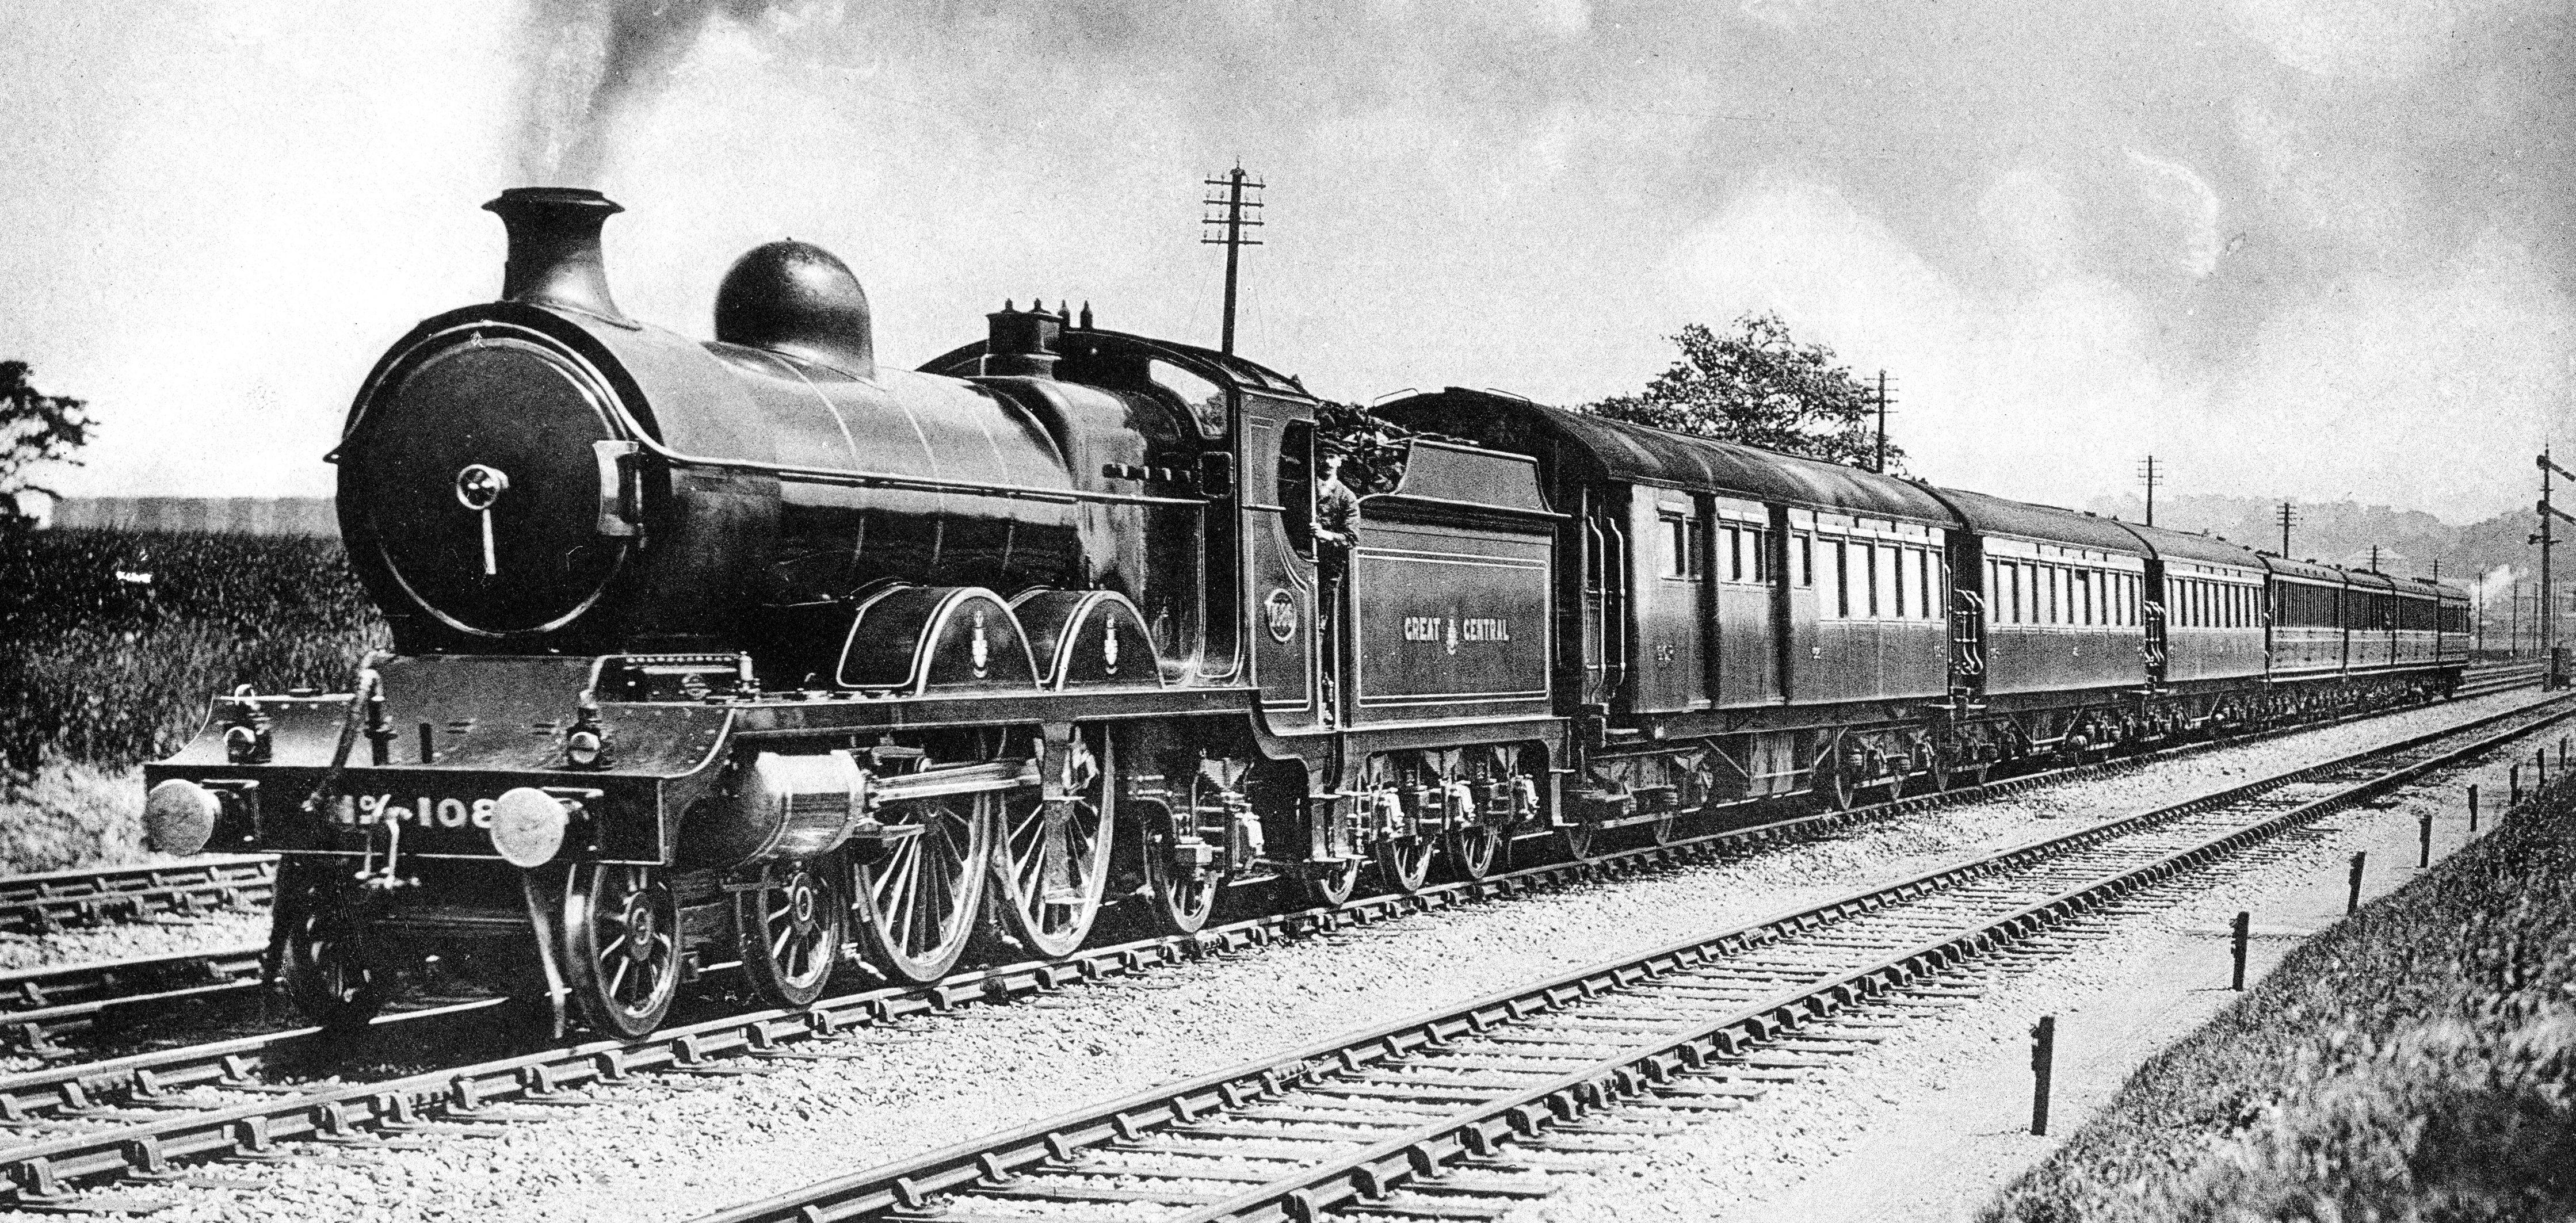 Nostalgia: East West Rail taking us Back to the Future...